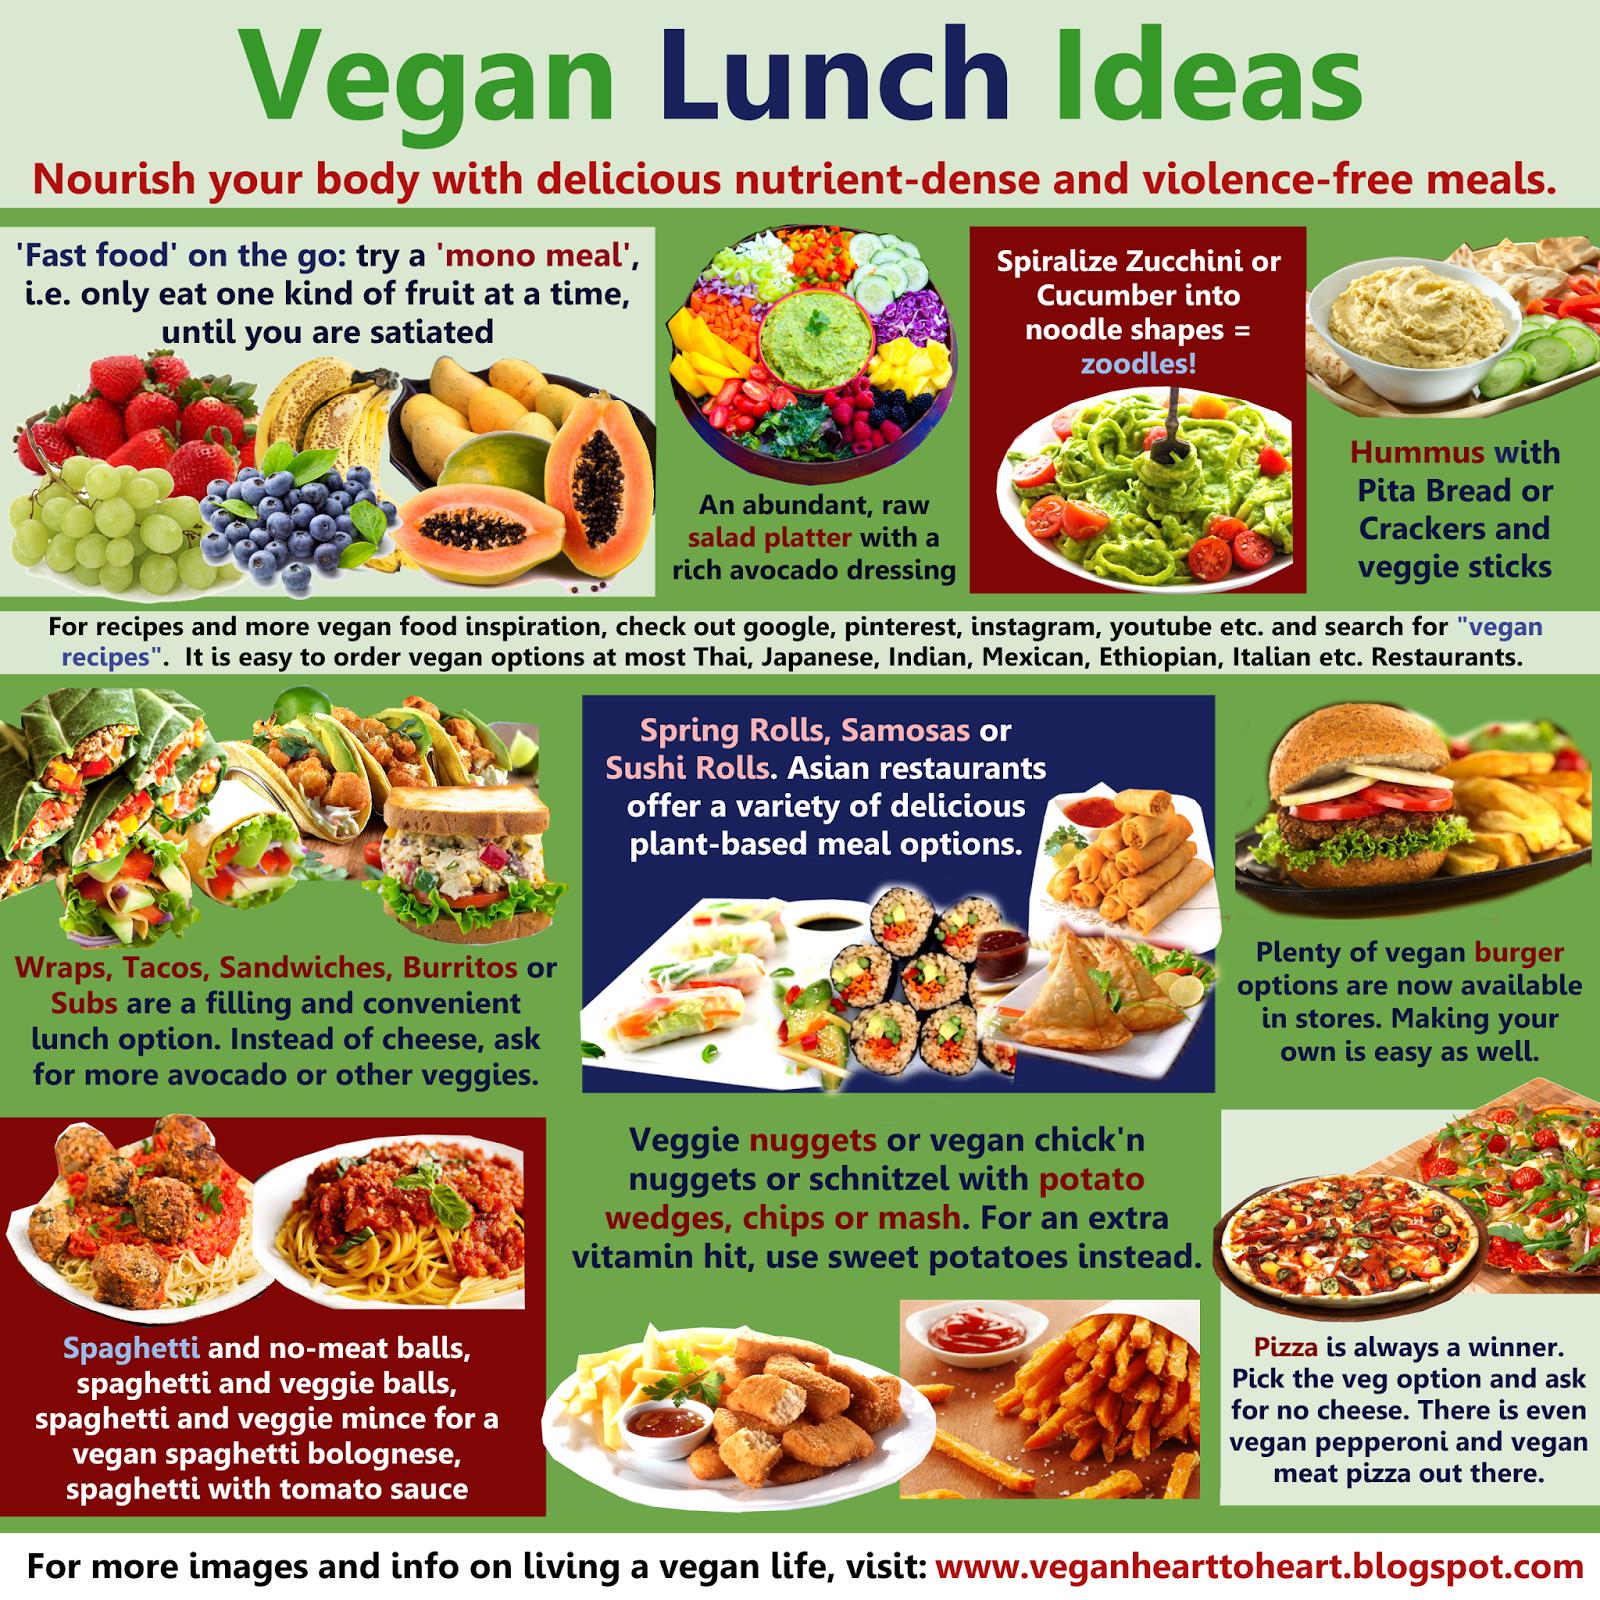 Vegan heart to heart vegan lunch ideas thursday september 24 2015 forumfinder Choice Image